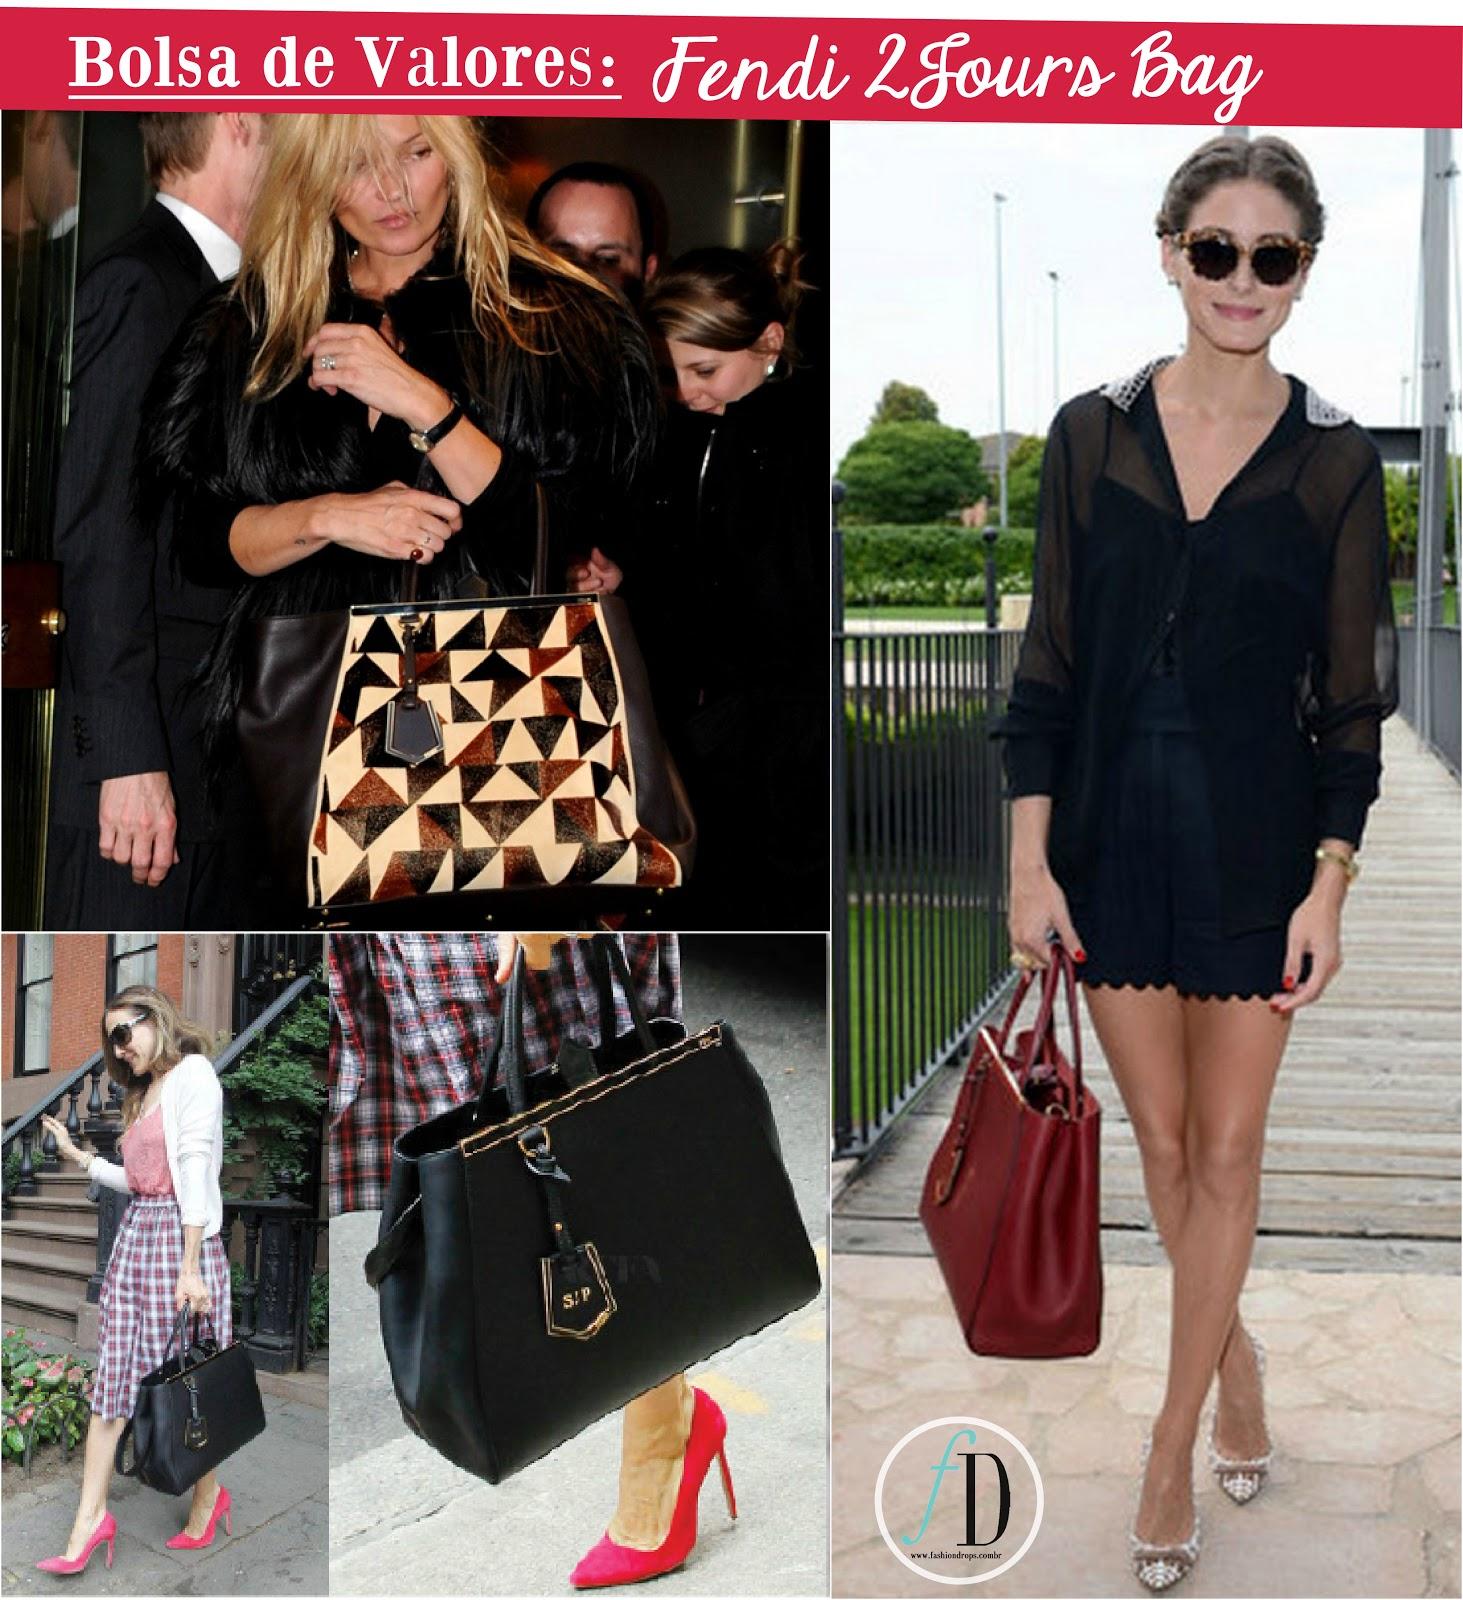 http://2.bp.blogspot.com/-25h3fLXHzEE/UMCyebYsL8I/AAAAAAAAAqI/kVp6LnK3lOU/s1600/olivia+palermo-+kate+moss-+sarah+jessica+parker-+2jours-+bag-+fendi-+fashiondrops.jpg